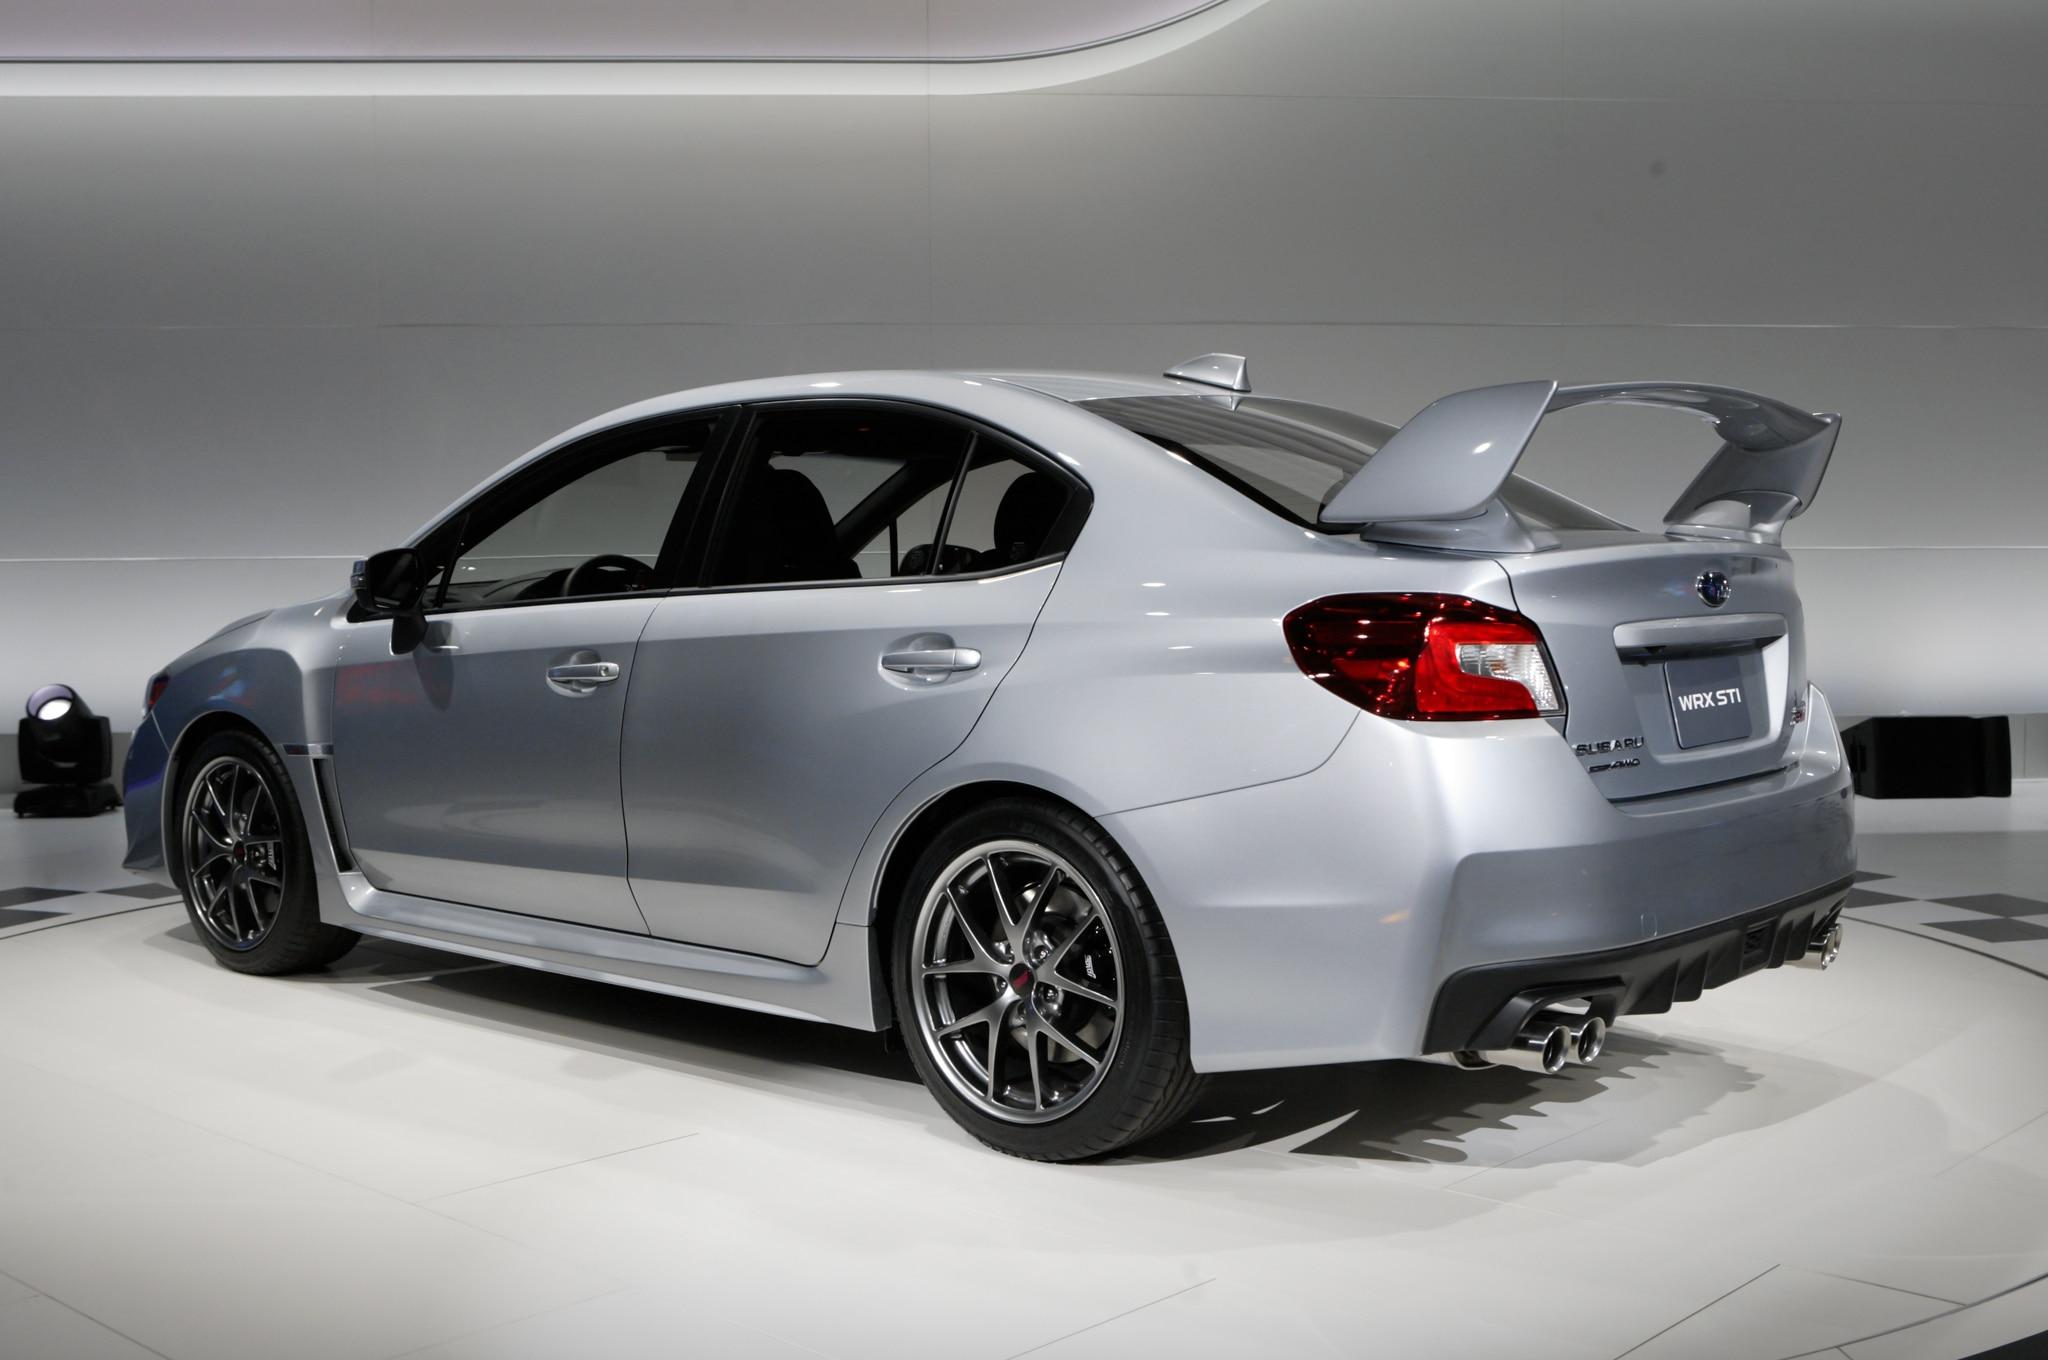 2014 Subaru Wrx Sti Hatchback >> 2017 Subaru WRX, WRX STI, 2016 Subaru Crosstrek SE Priced | Automobile Magazine